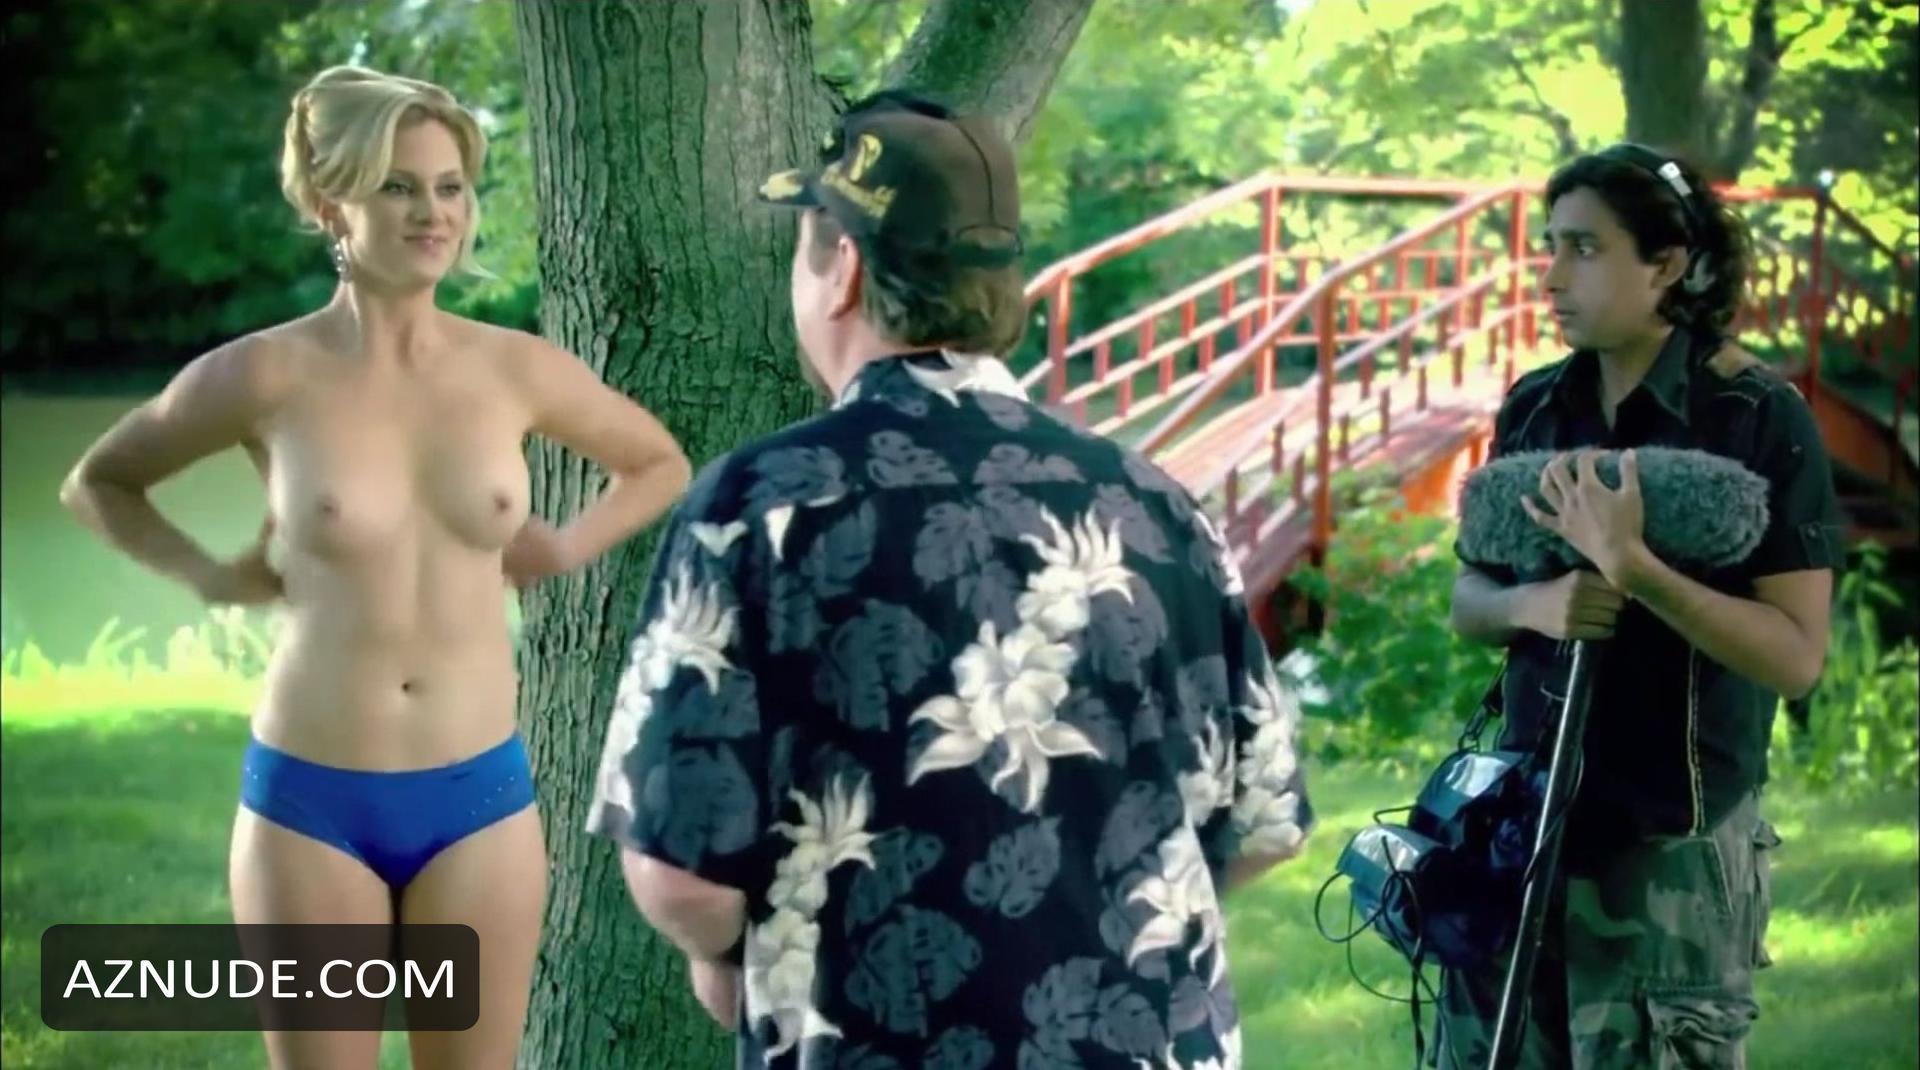 nicole arbour topless